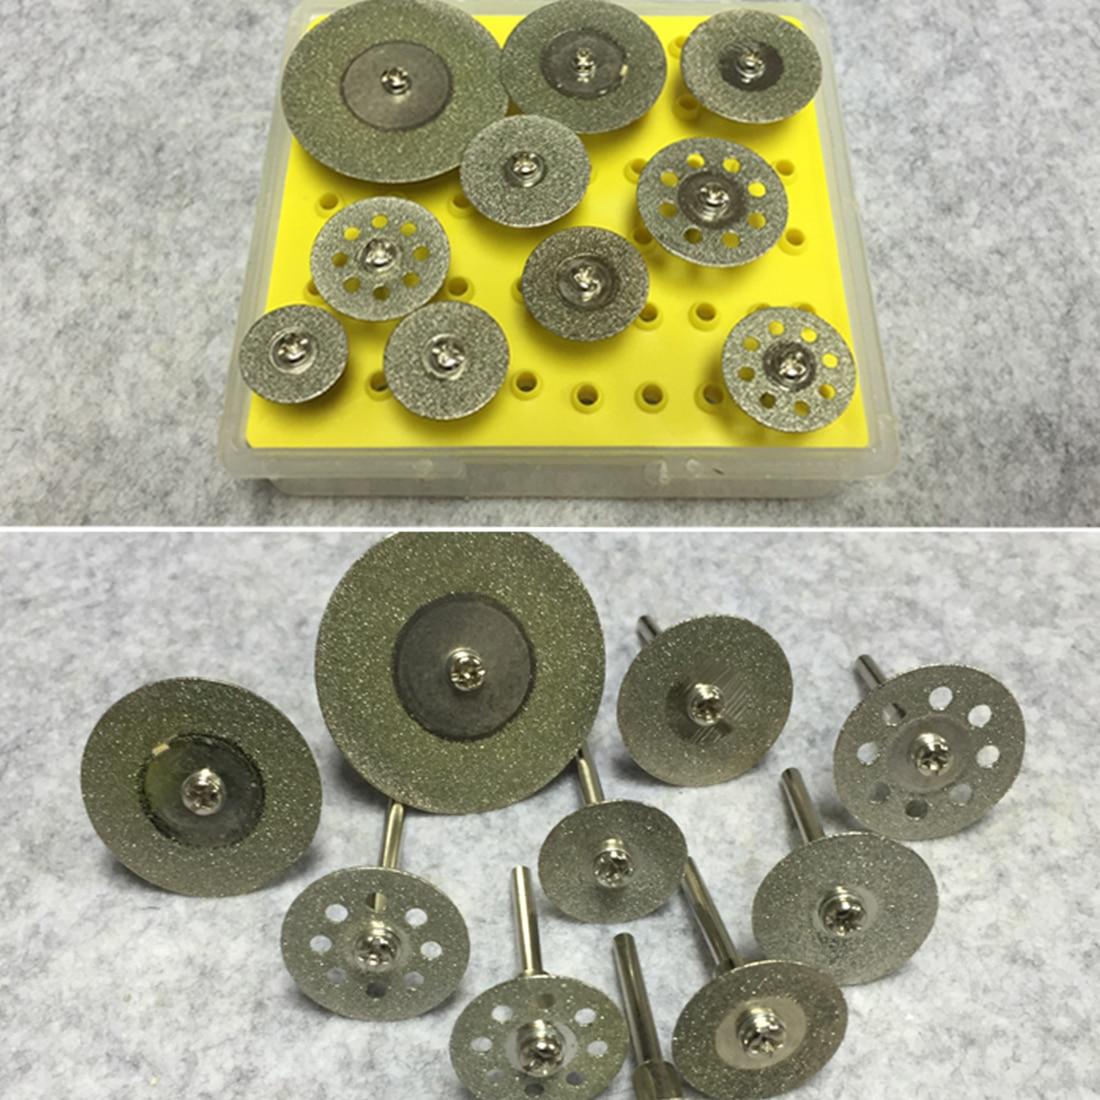 Cutting / Grinding / Engraving Tools 10Pcs Diamond Cutting Discs Cut-off Hold Wheel Set For Dremel Rotary Tool цены